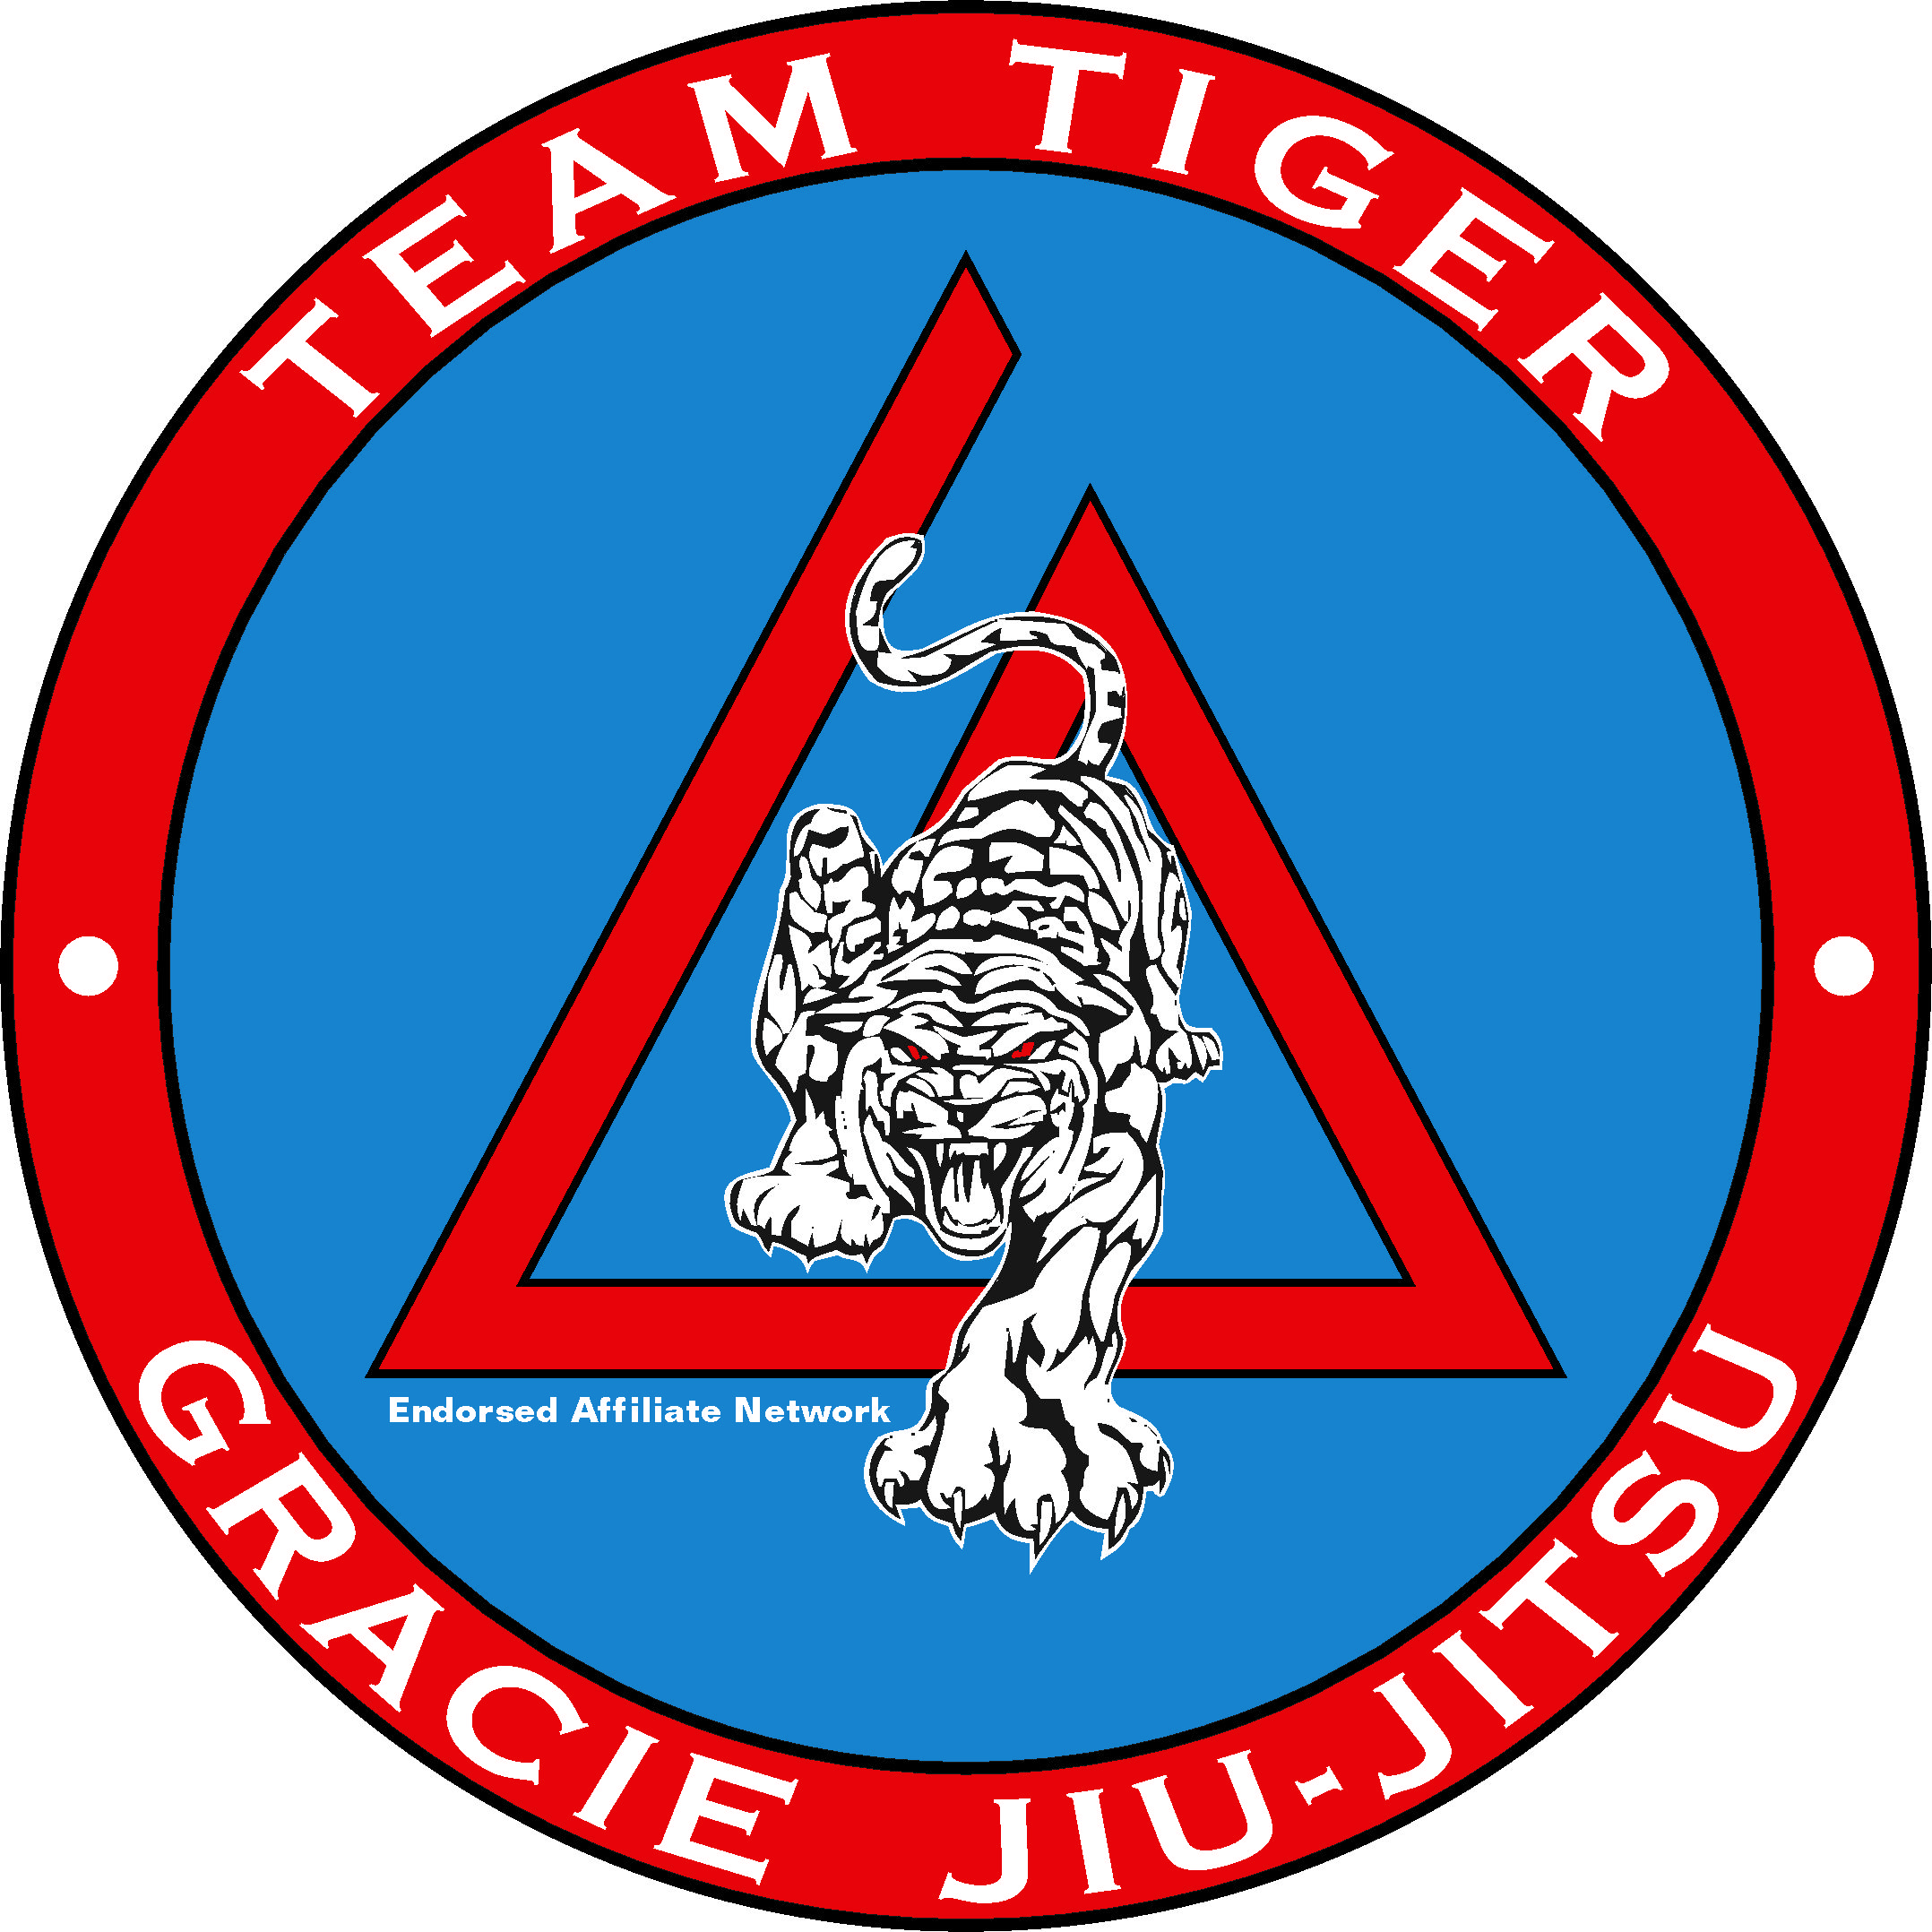 Imperatori Family Martial Arts of Atlanta | Our Associations